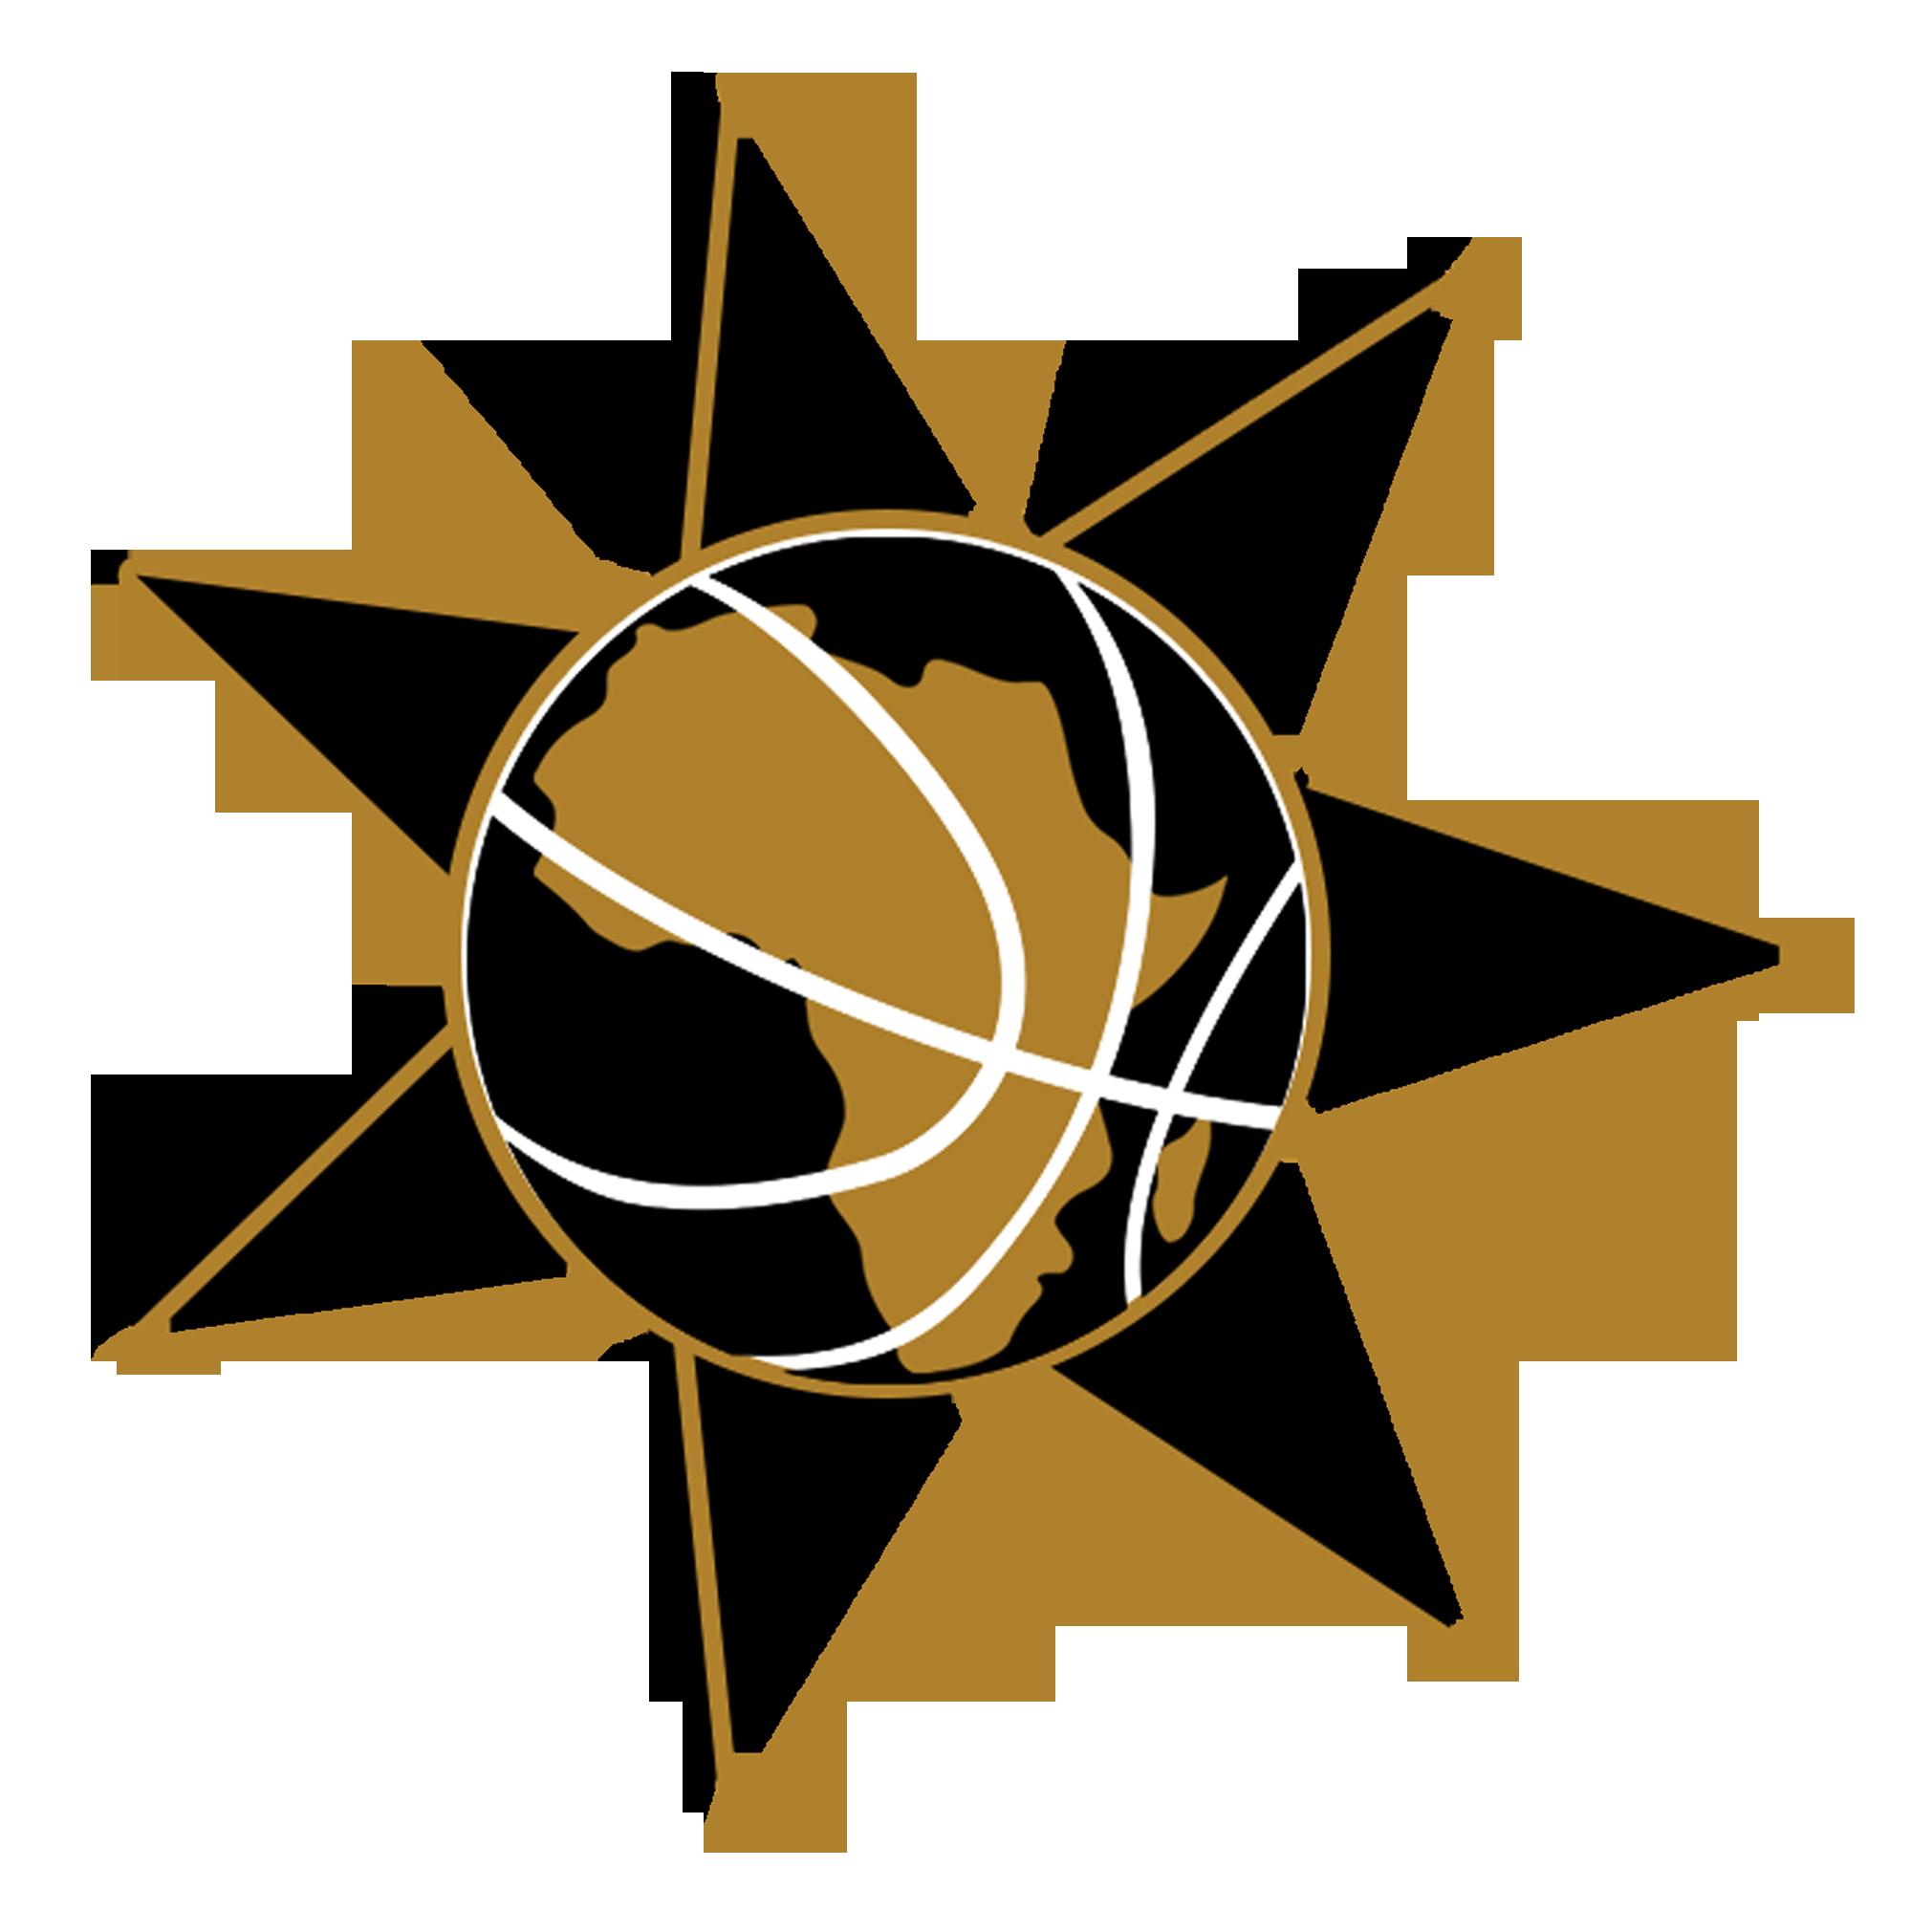 International Basketball Federation (FIBA).